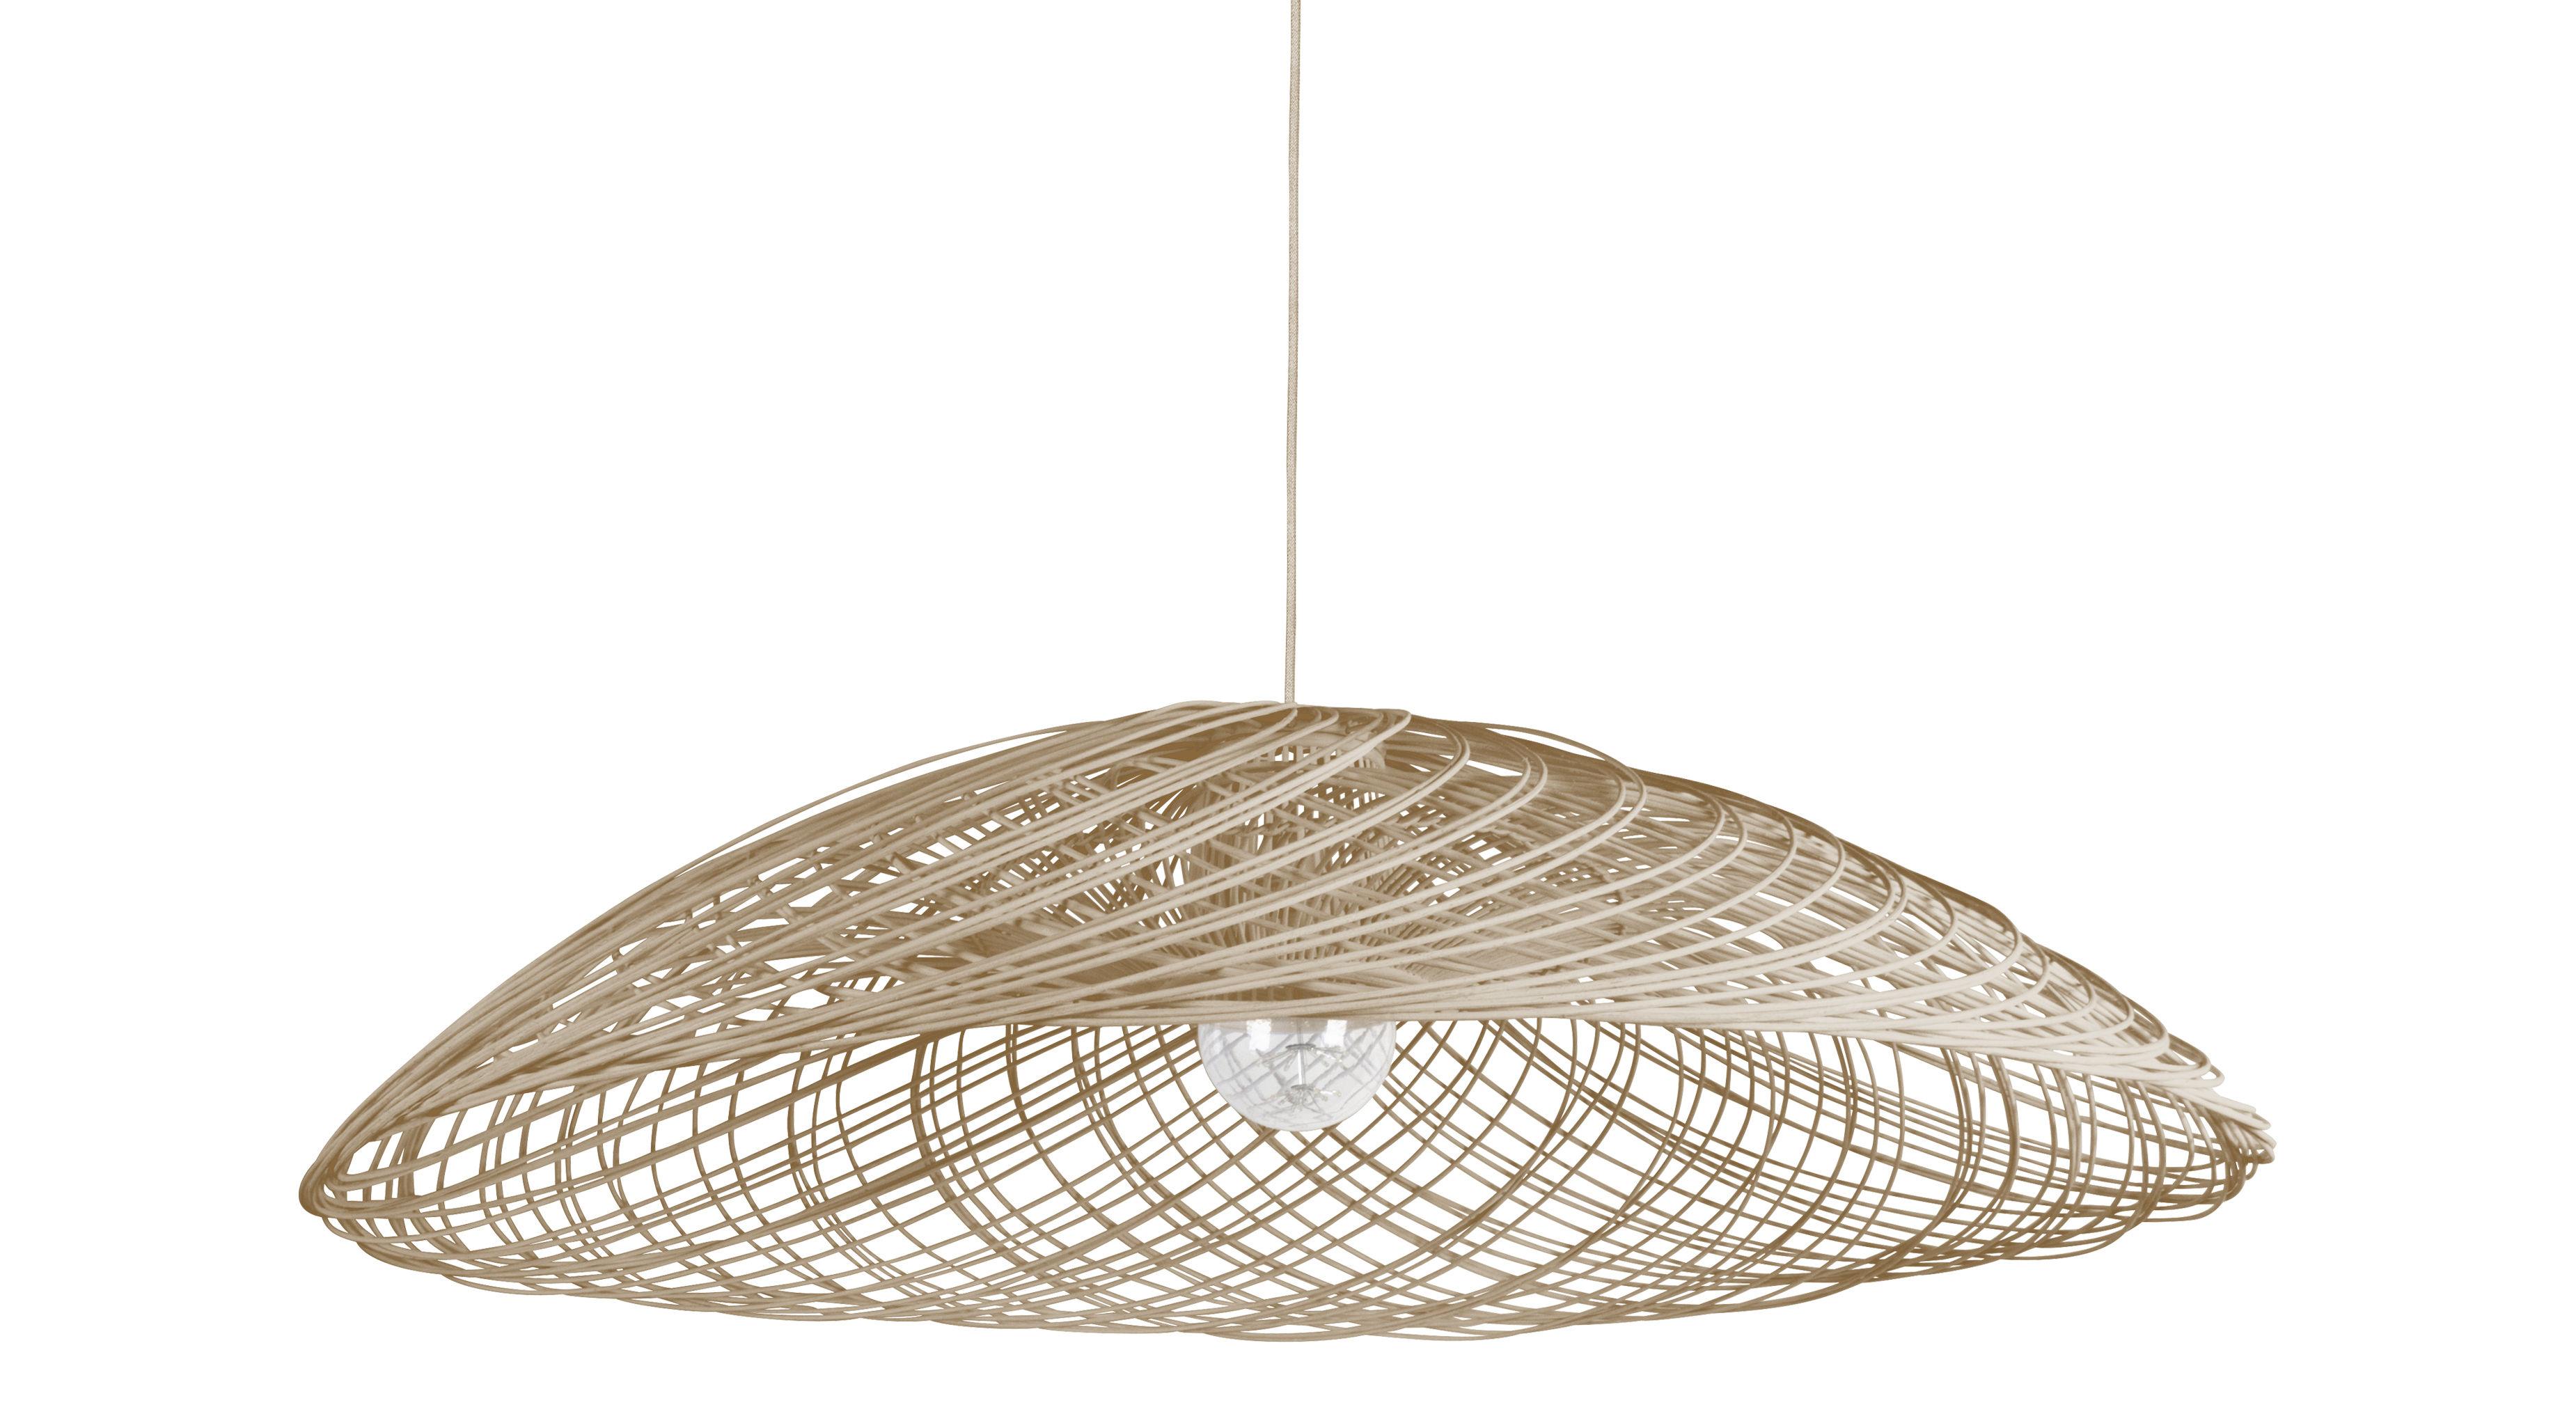 Illuminazione - Lampadari - Sospensione Satélise S / rattan - Ø 45 cm - Forestier - Naturel - Midollino, Tessuto